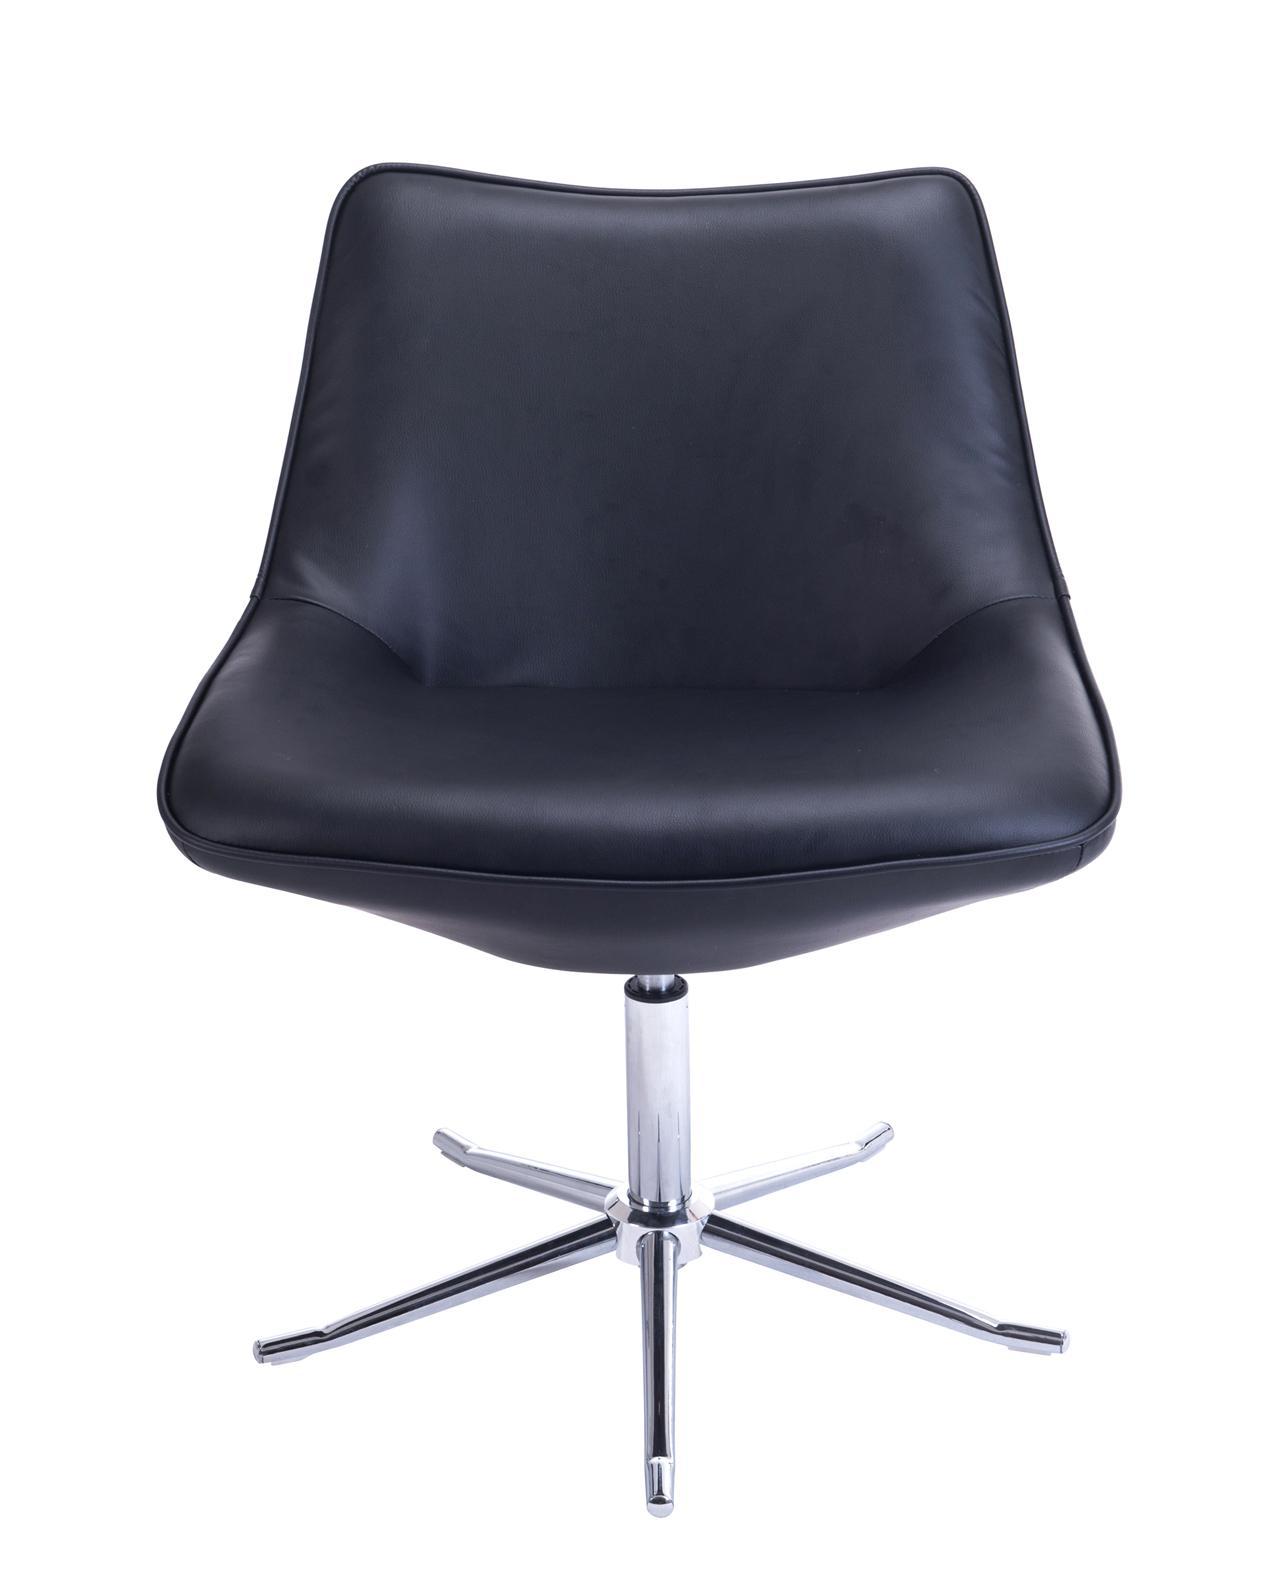 fauteuil lounge design moderne pietement metal don. Black Bedroom Furniture Sets. Home Design Ideas